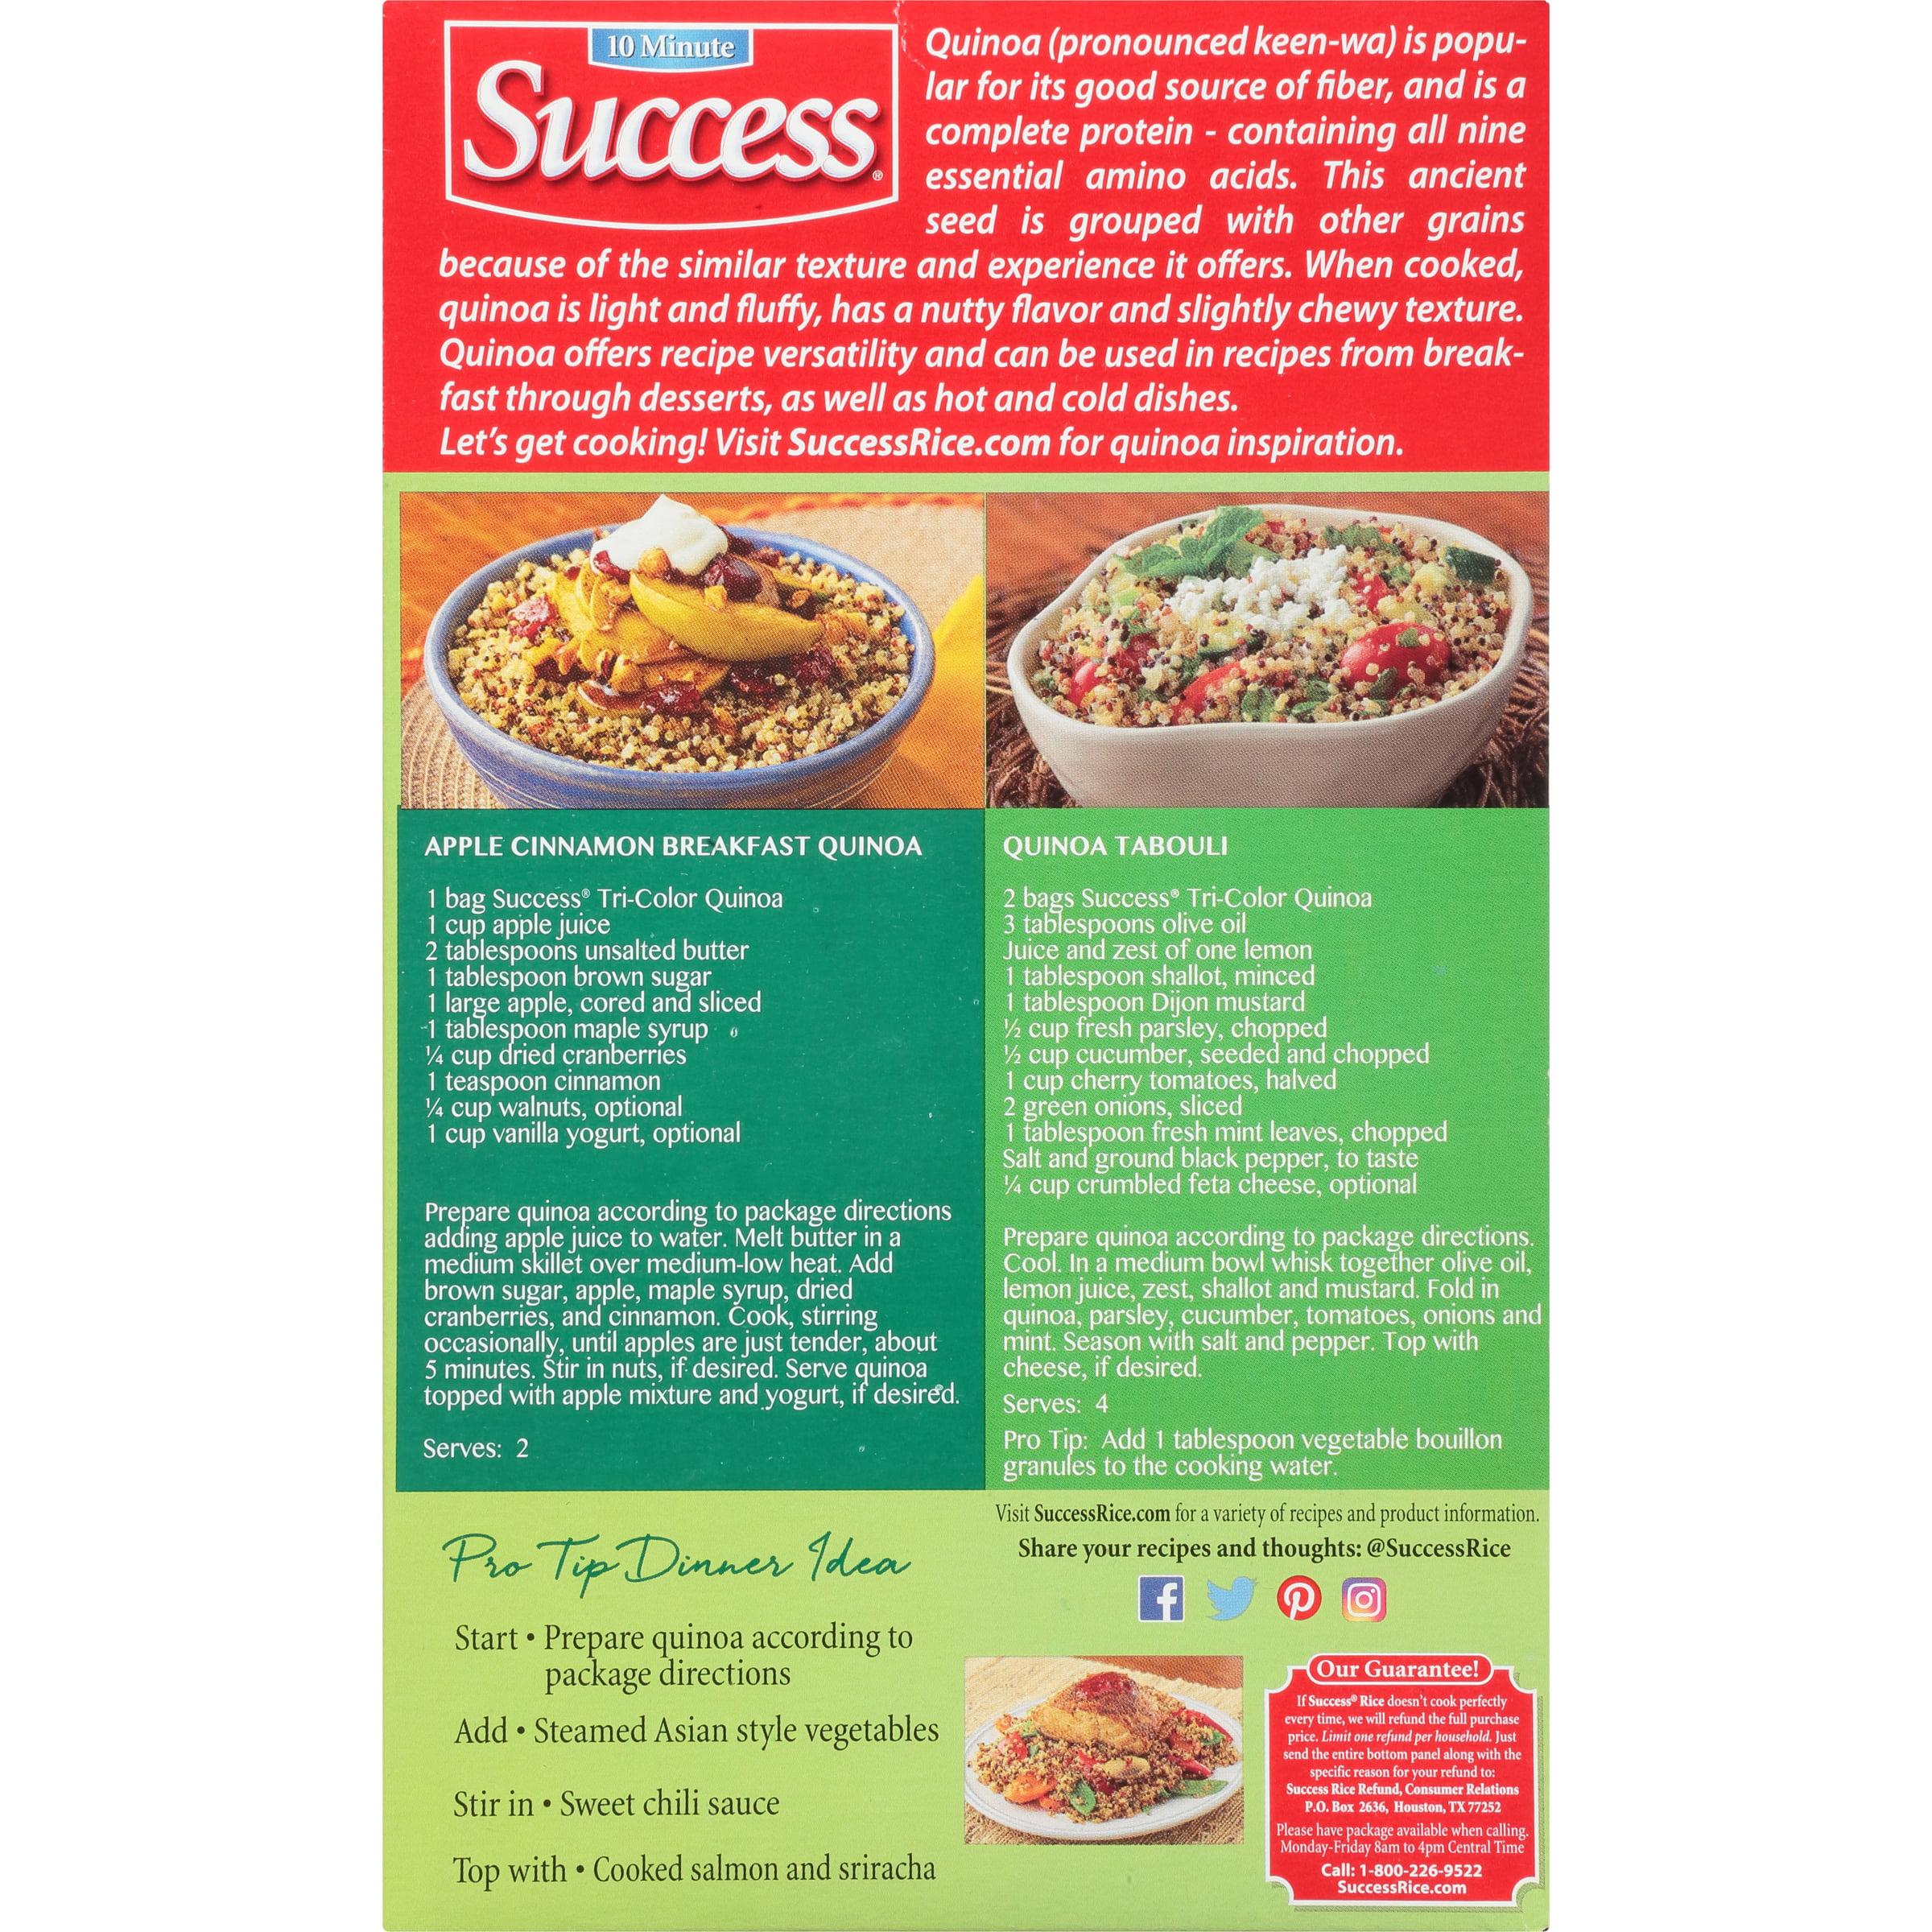 Success Boil-in-Bag Tri-Color Quinoa, 12-Ounce Box - Walmart com